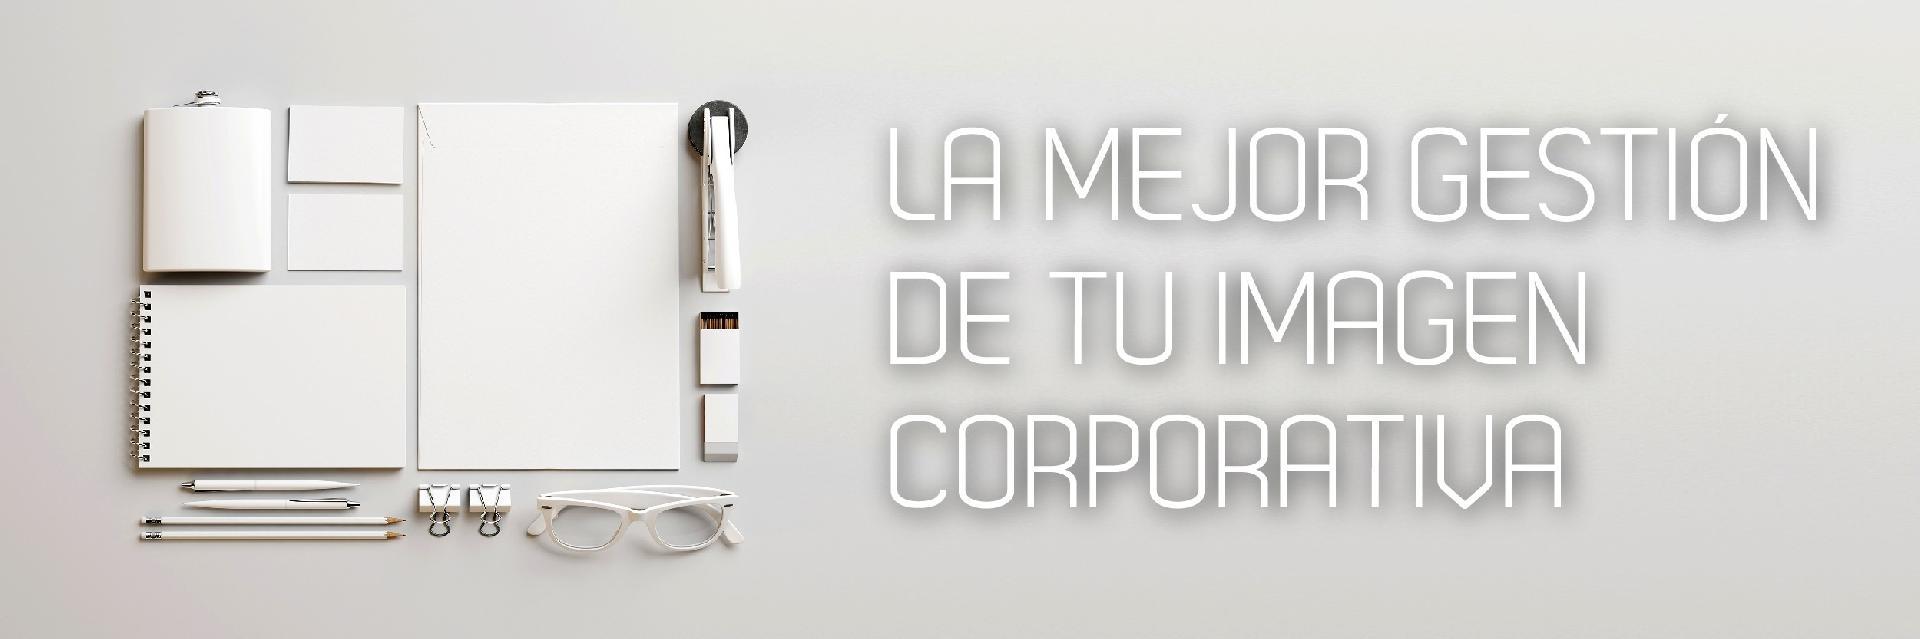 imagen corporativa artecomp